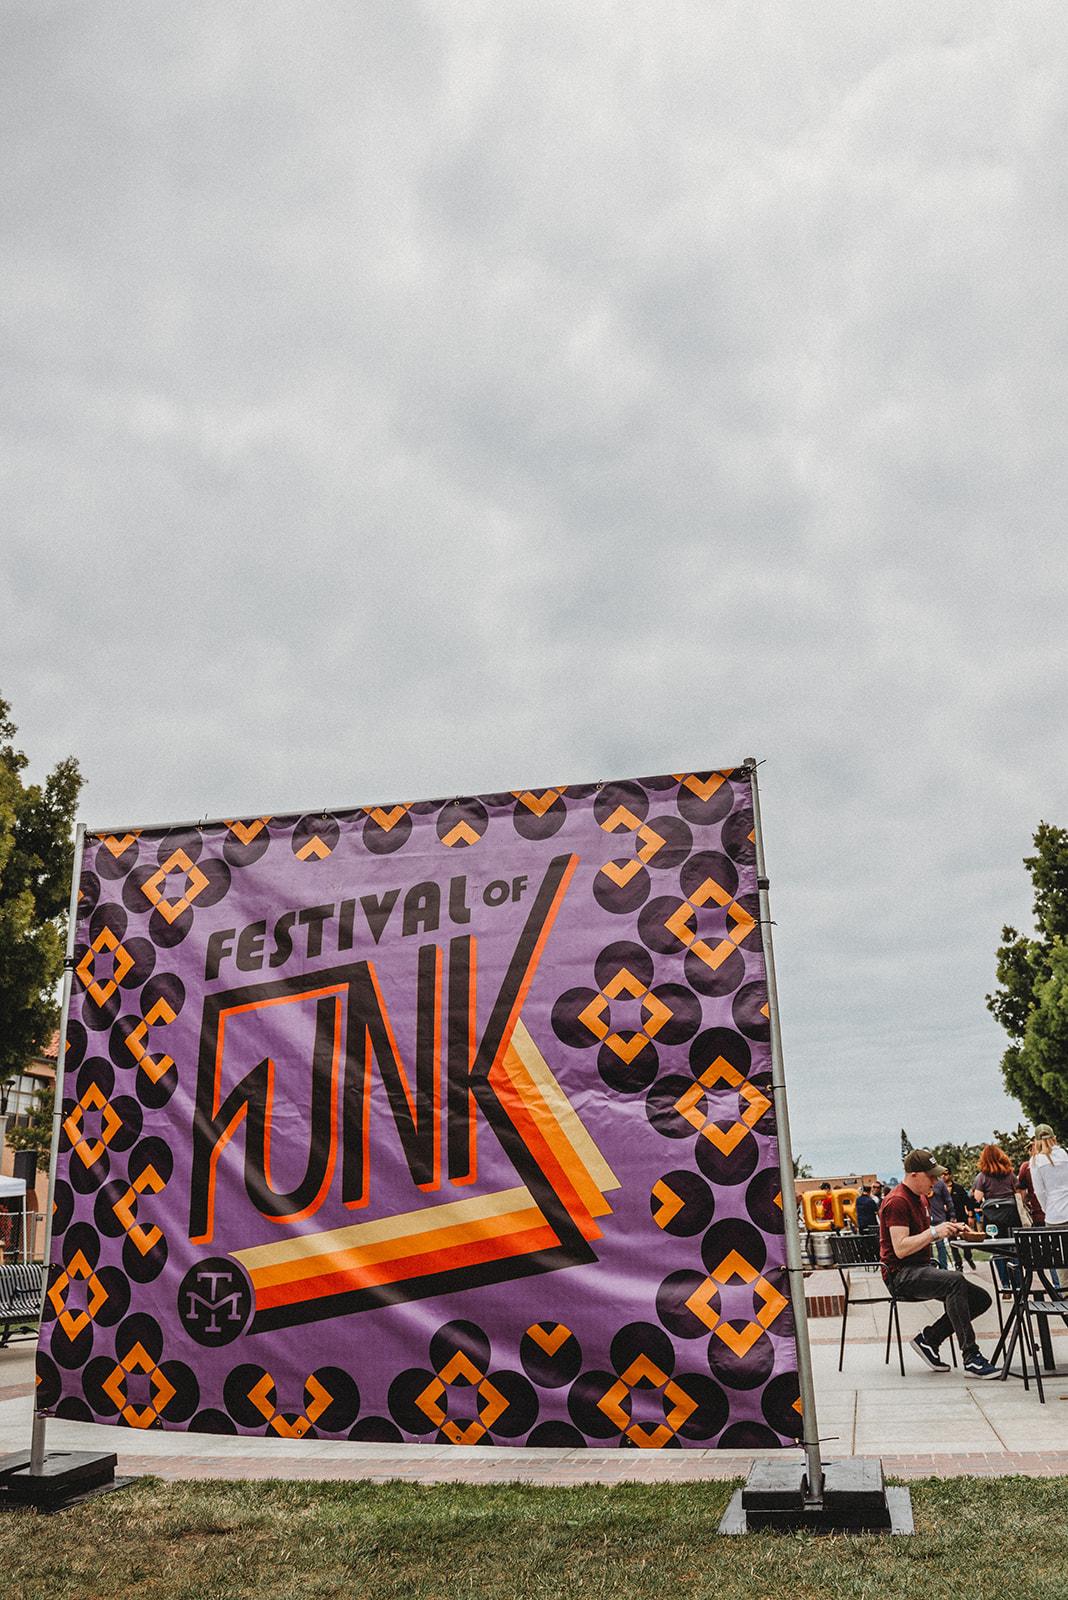 FestivalofFunk-4.jpg_websize.jpg